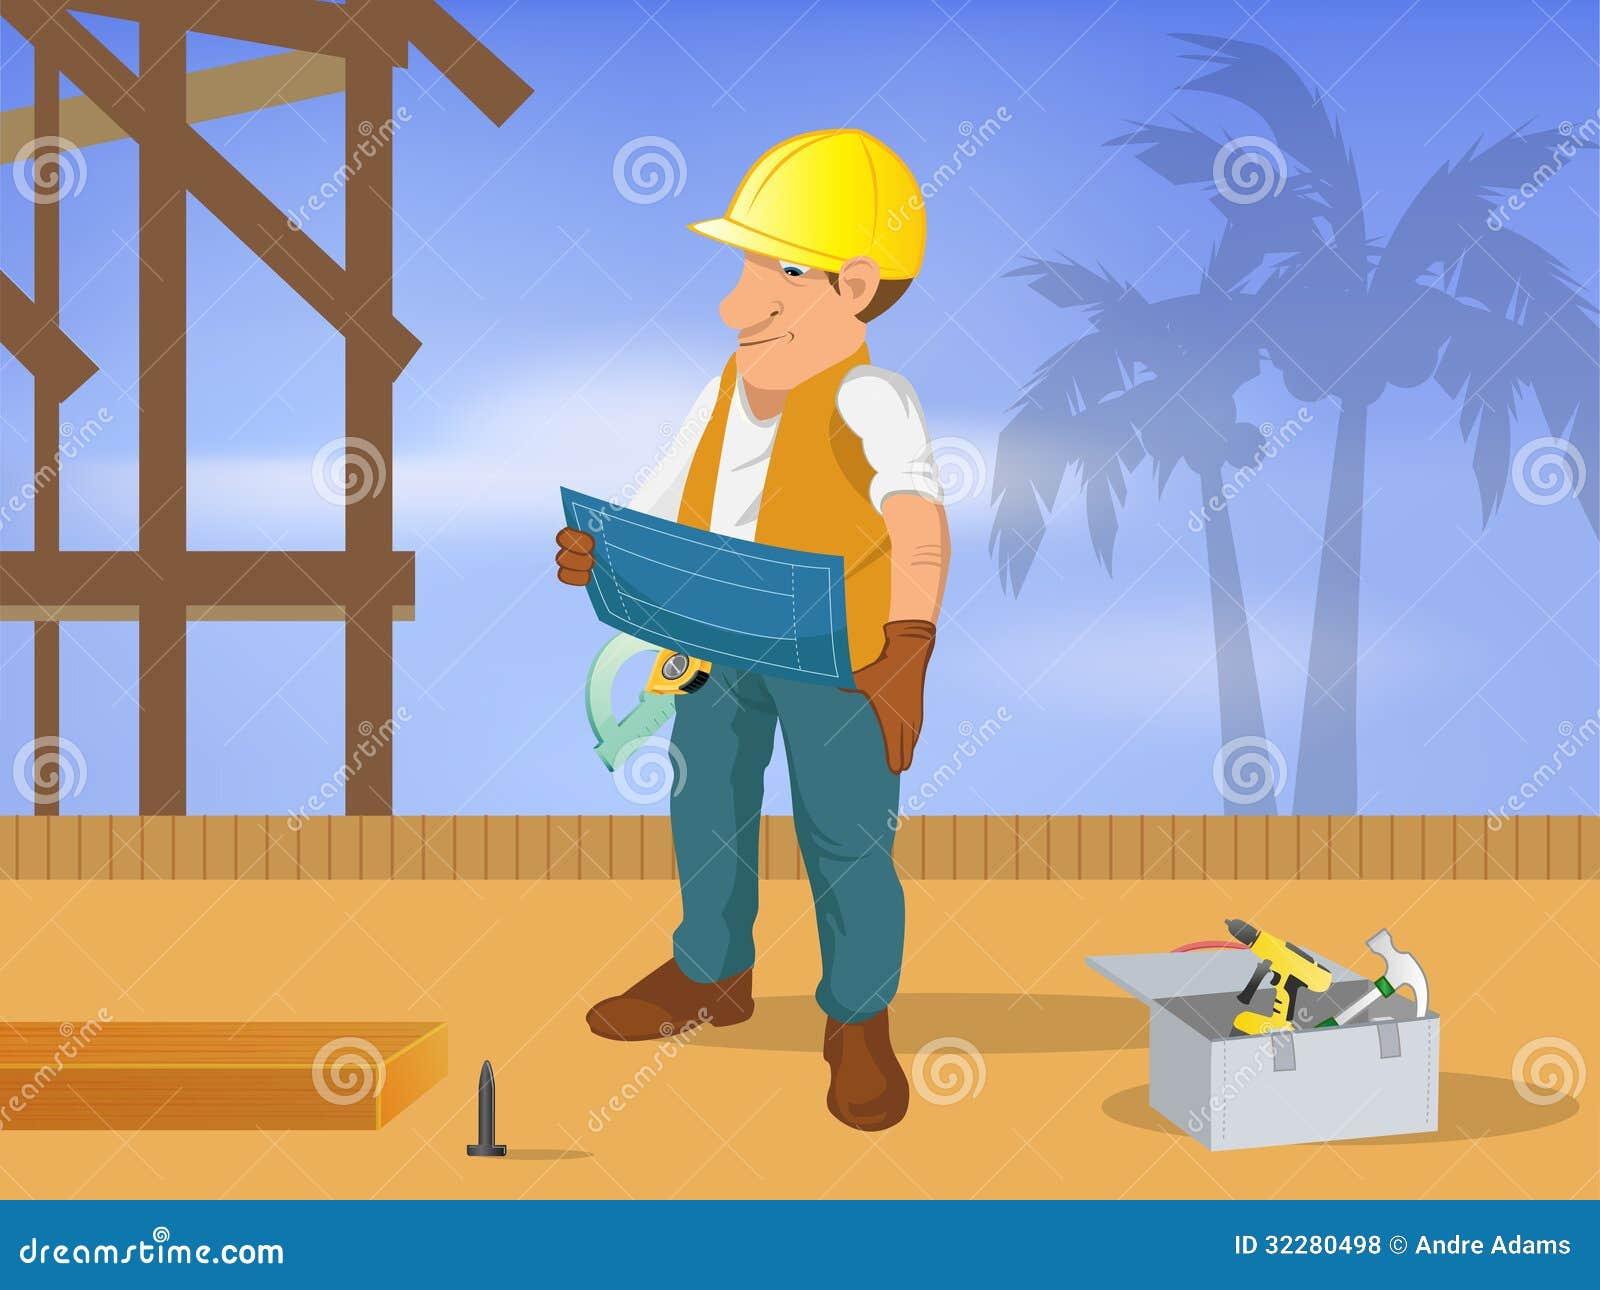 Carpenter blueprint stock illustrations 470 carpenter blueprint carpenter blueprint stock illustrations 470 carpenter blueprint stock illustrations vectors clipart dreamstime malvernweather Images